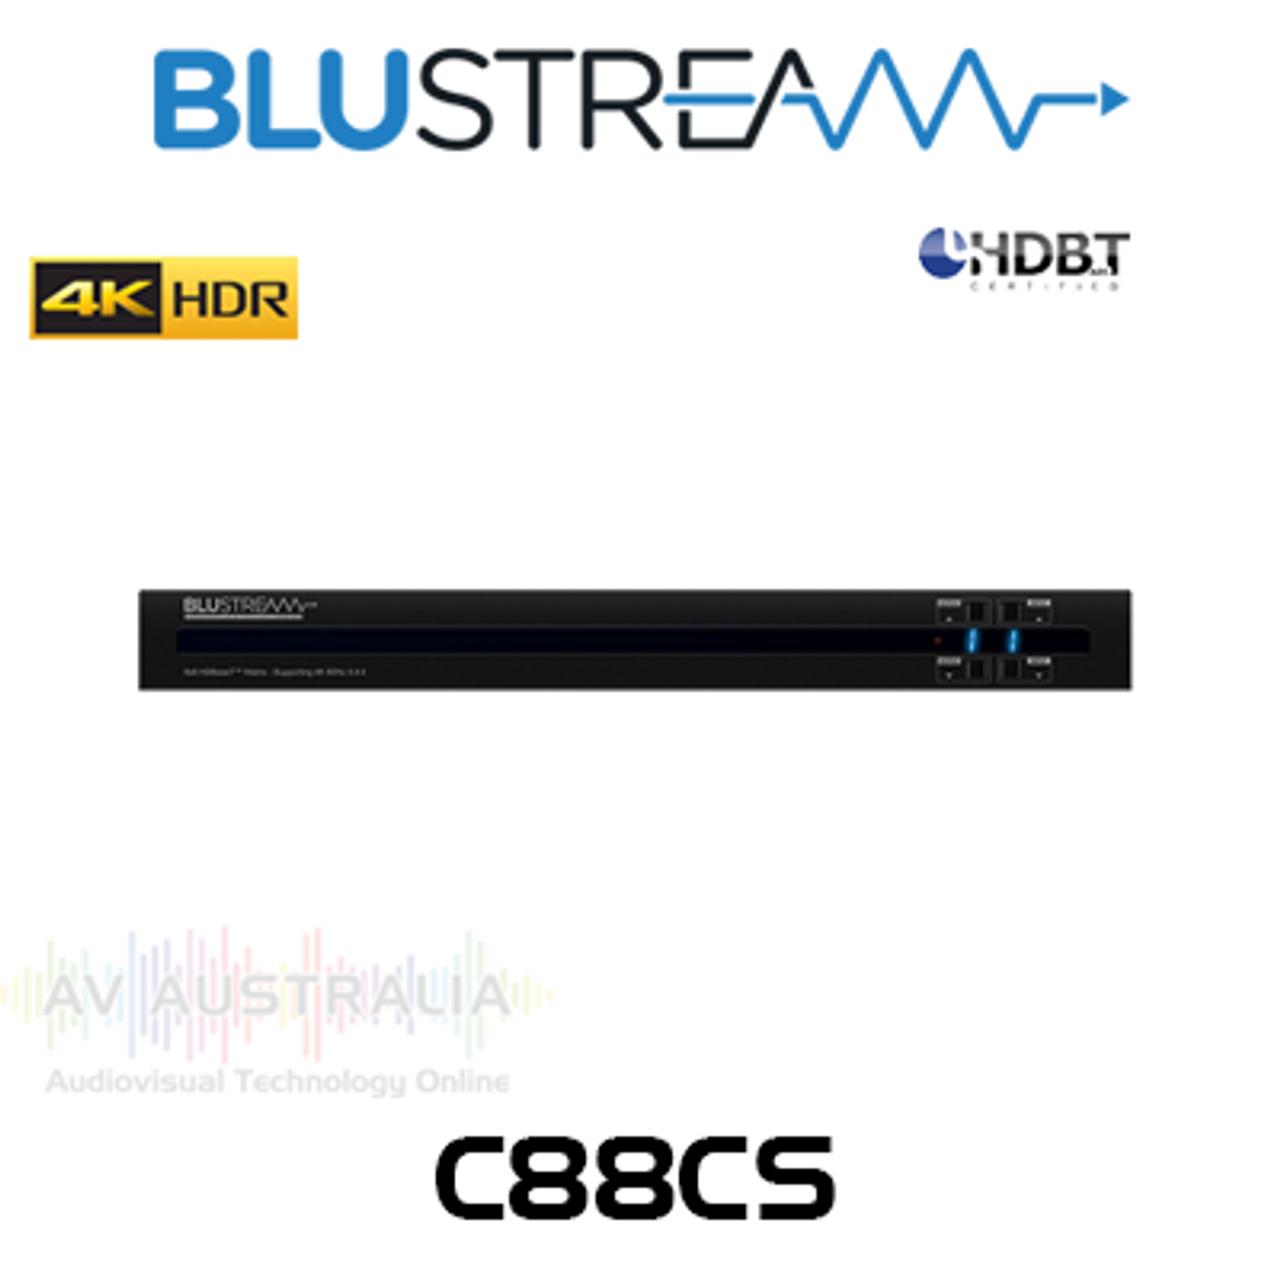 BluStream Contractor 8x8 4K HDR HDBaseT CSC Matrix Switcher (40m)